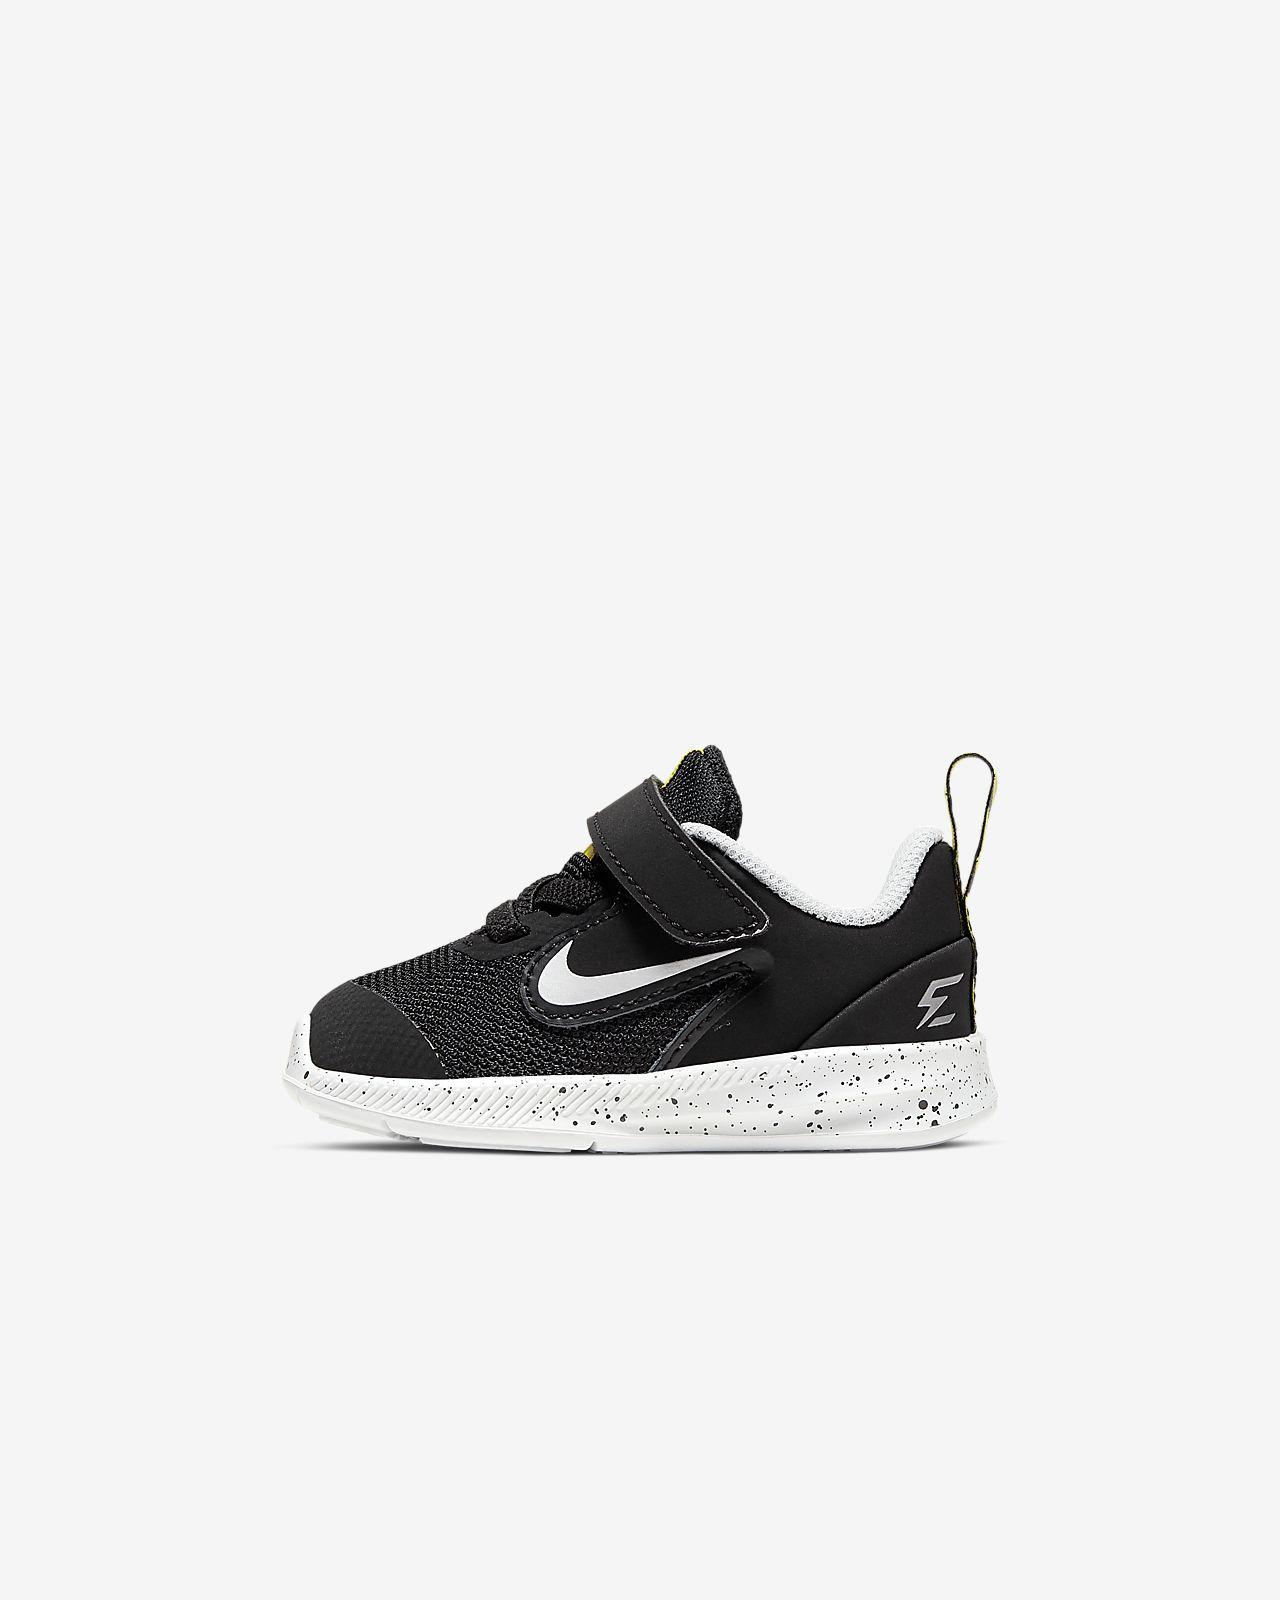 Nike Downshifter 9 RW Infant/Toddler Shoe